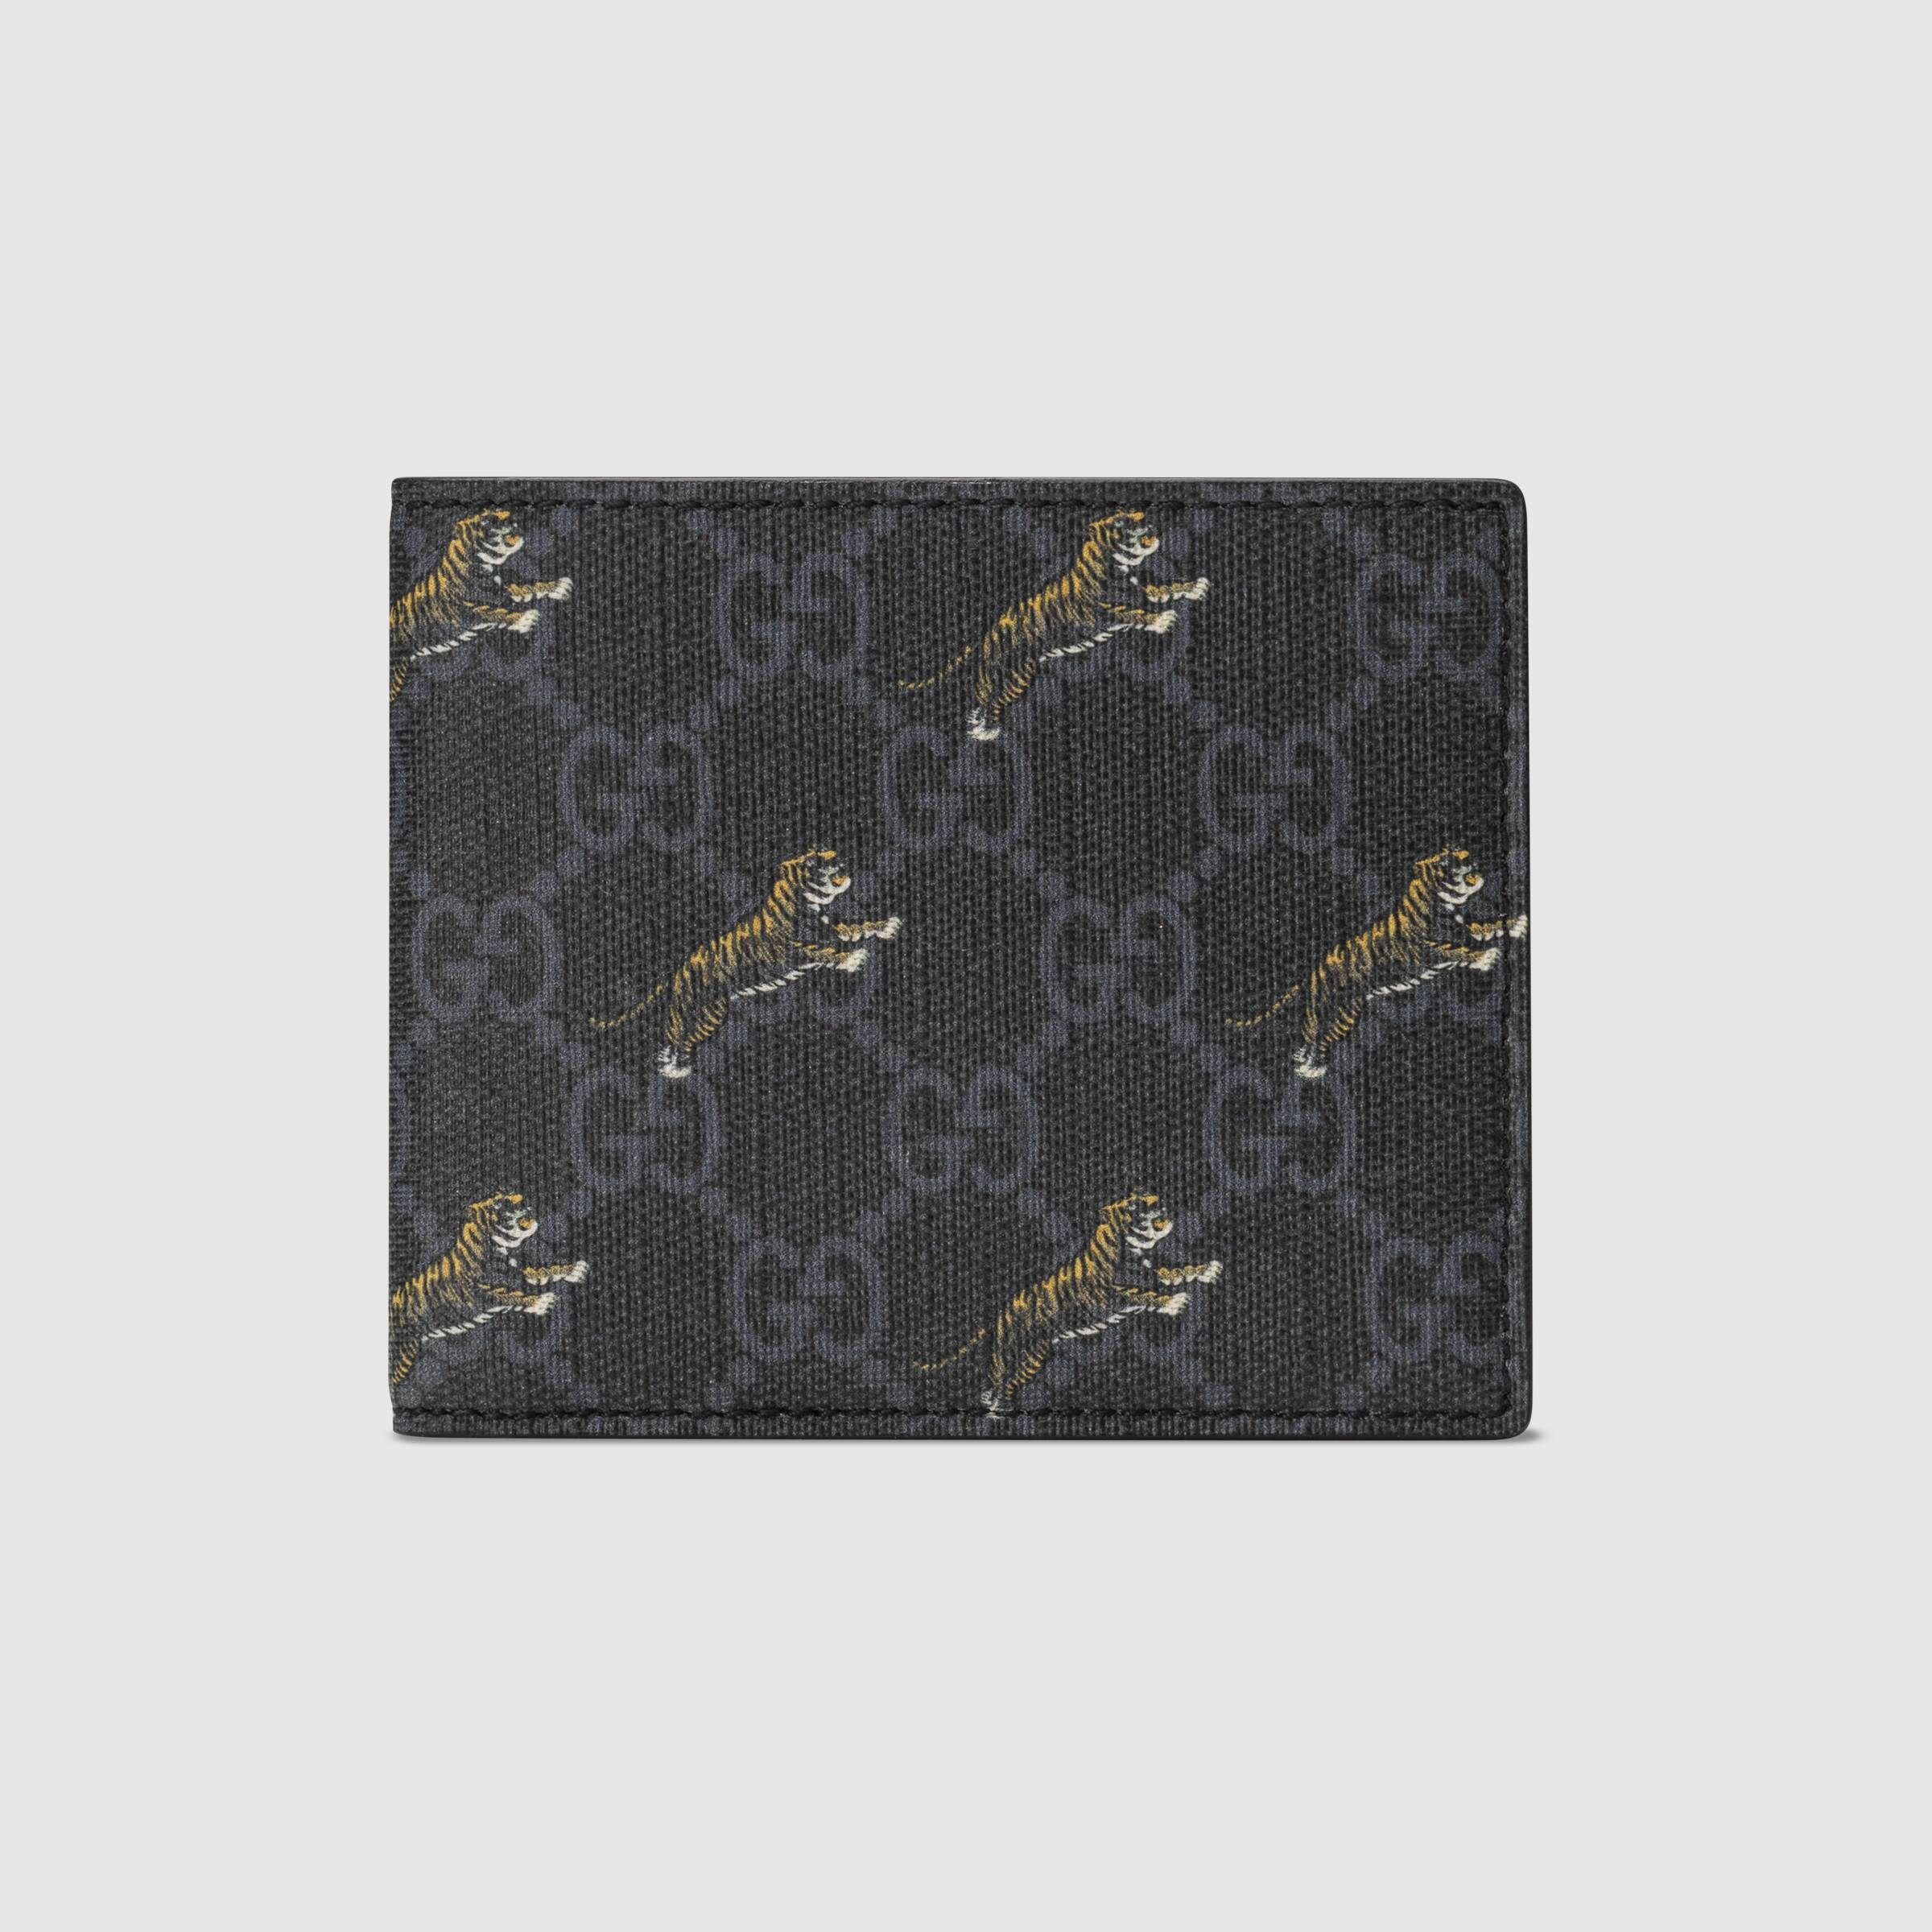 Gucci GG wallet with tiger print 575133 G2BAN 1087